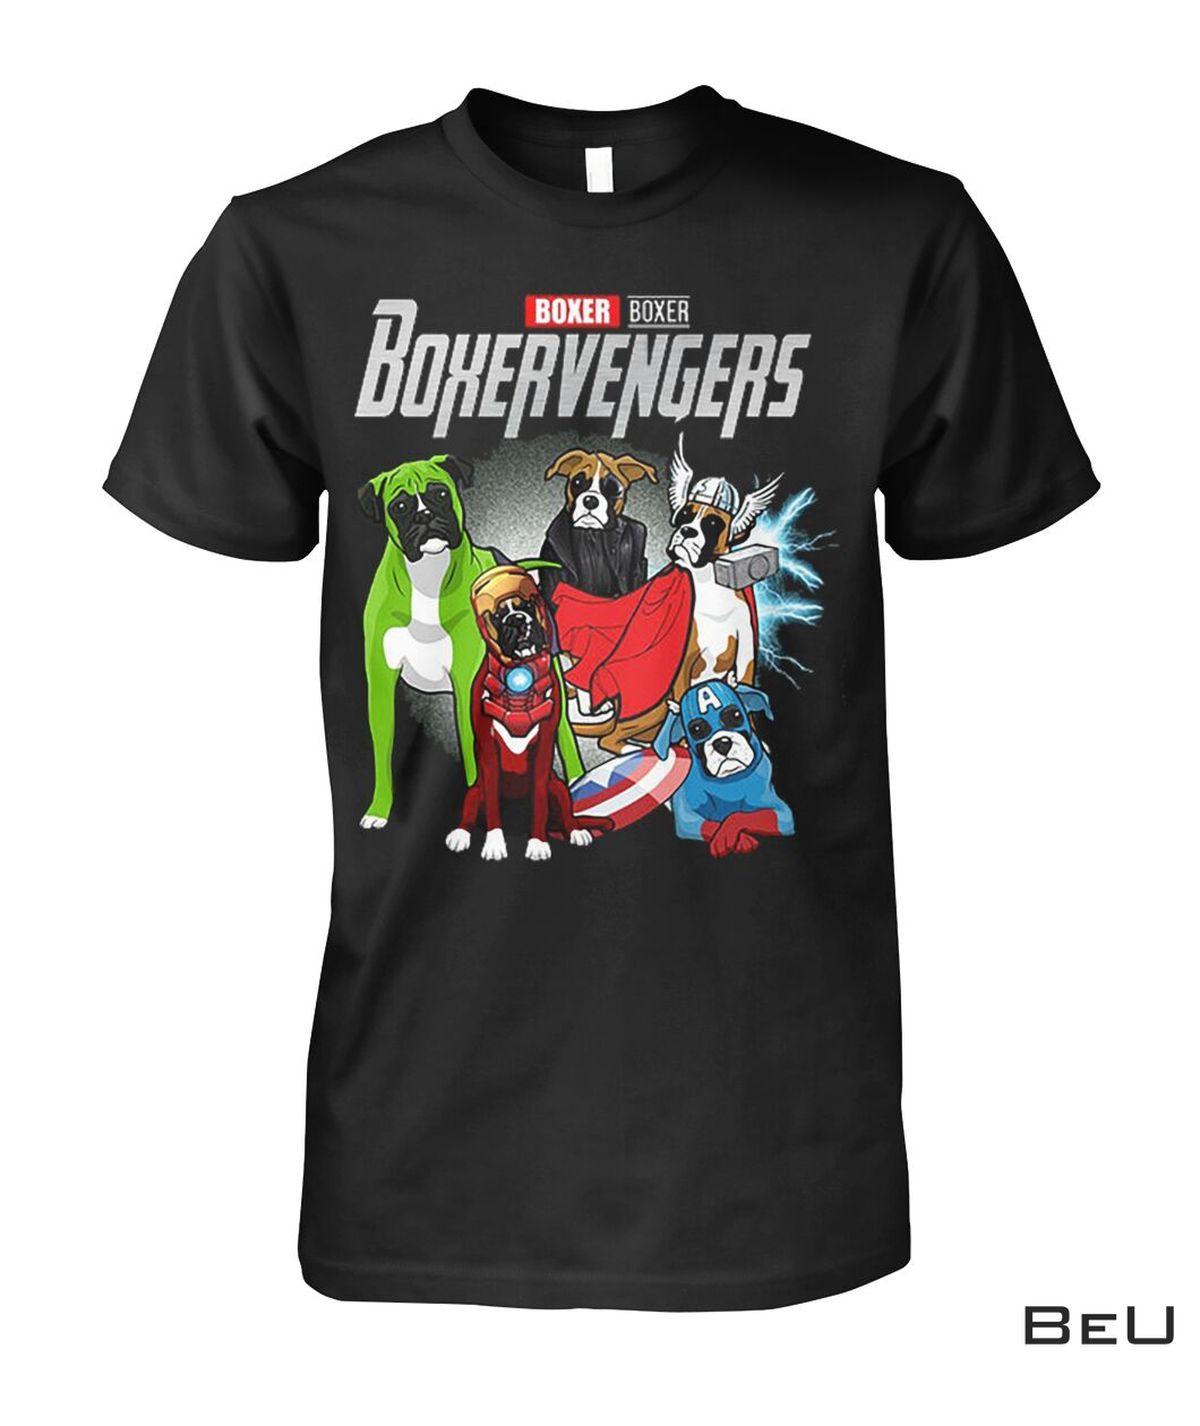 Boxer Boxervengers Avengers Shirt